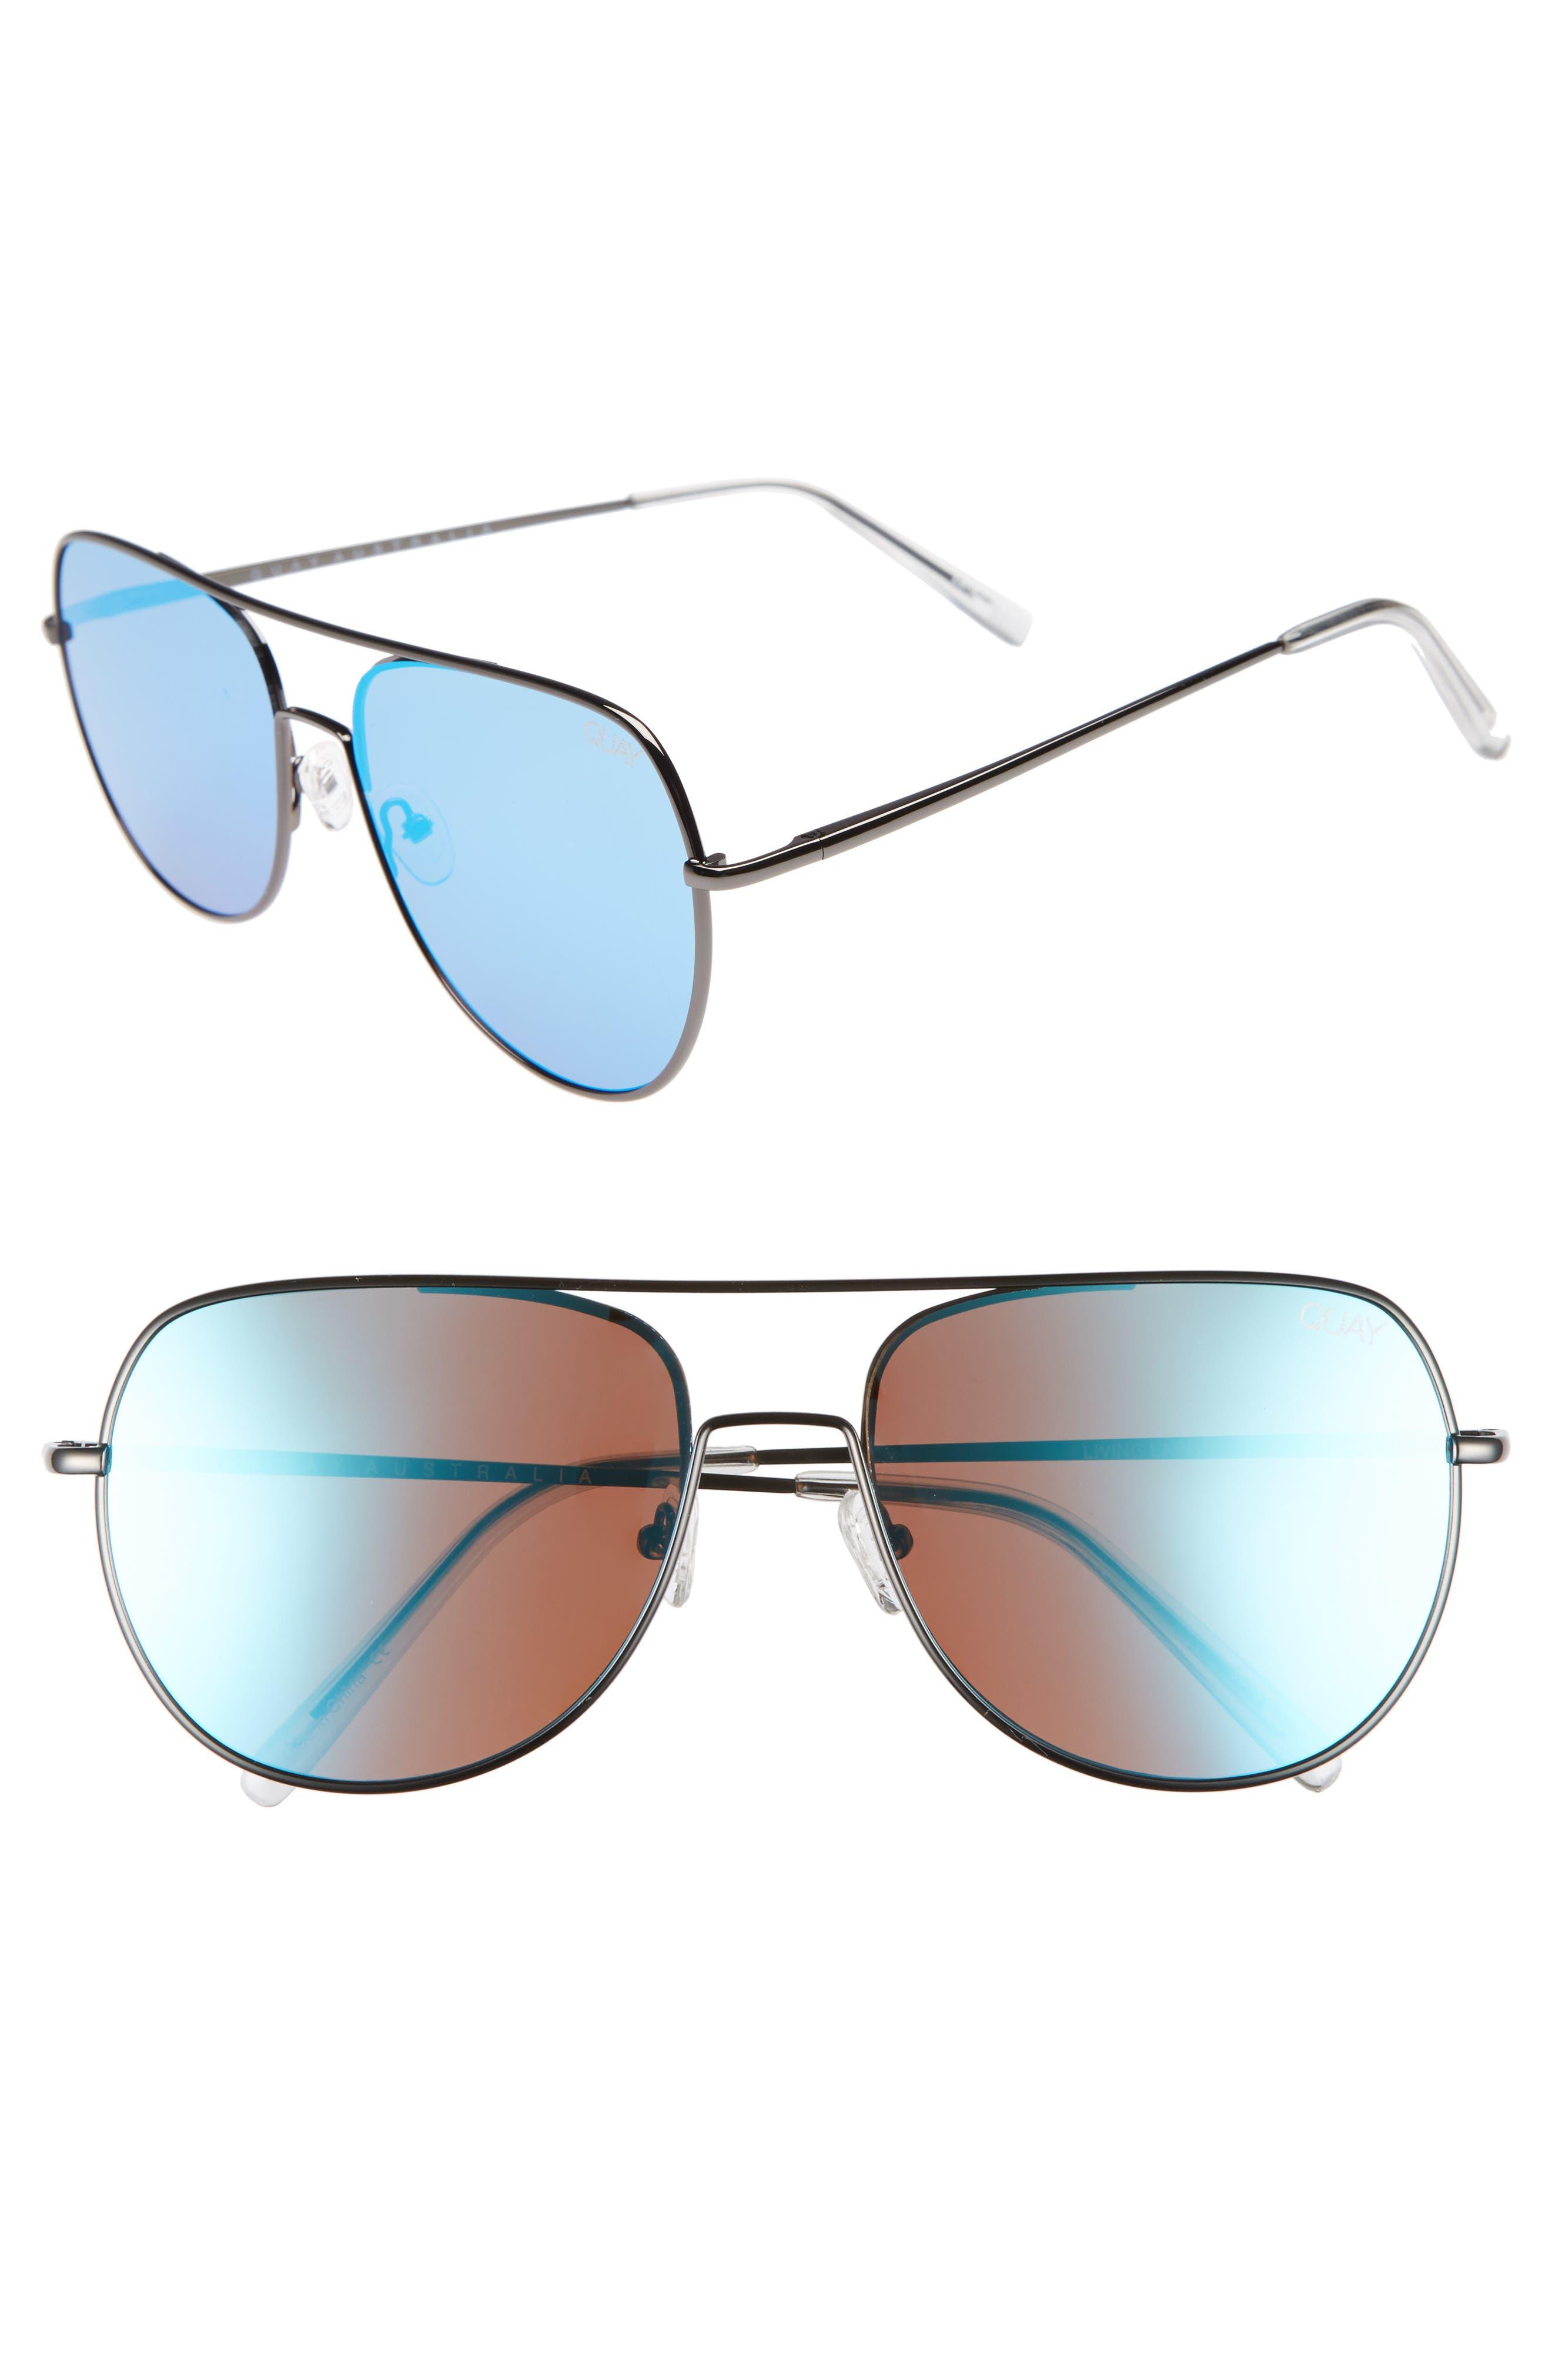 Living Large 58mm Aviator Sunglasses,                             Main thumbnail 1, color,                             DARK GREY/BLUE